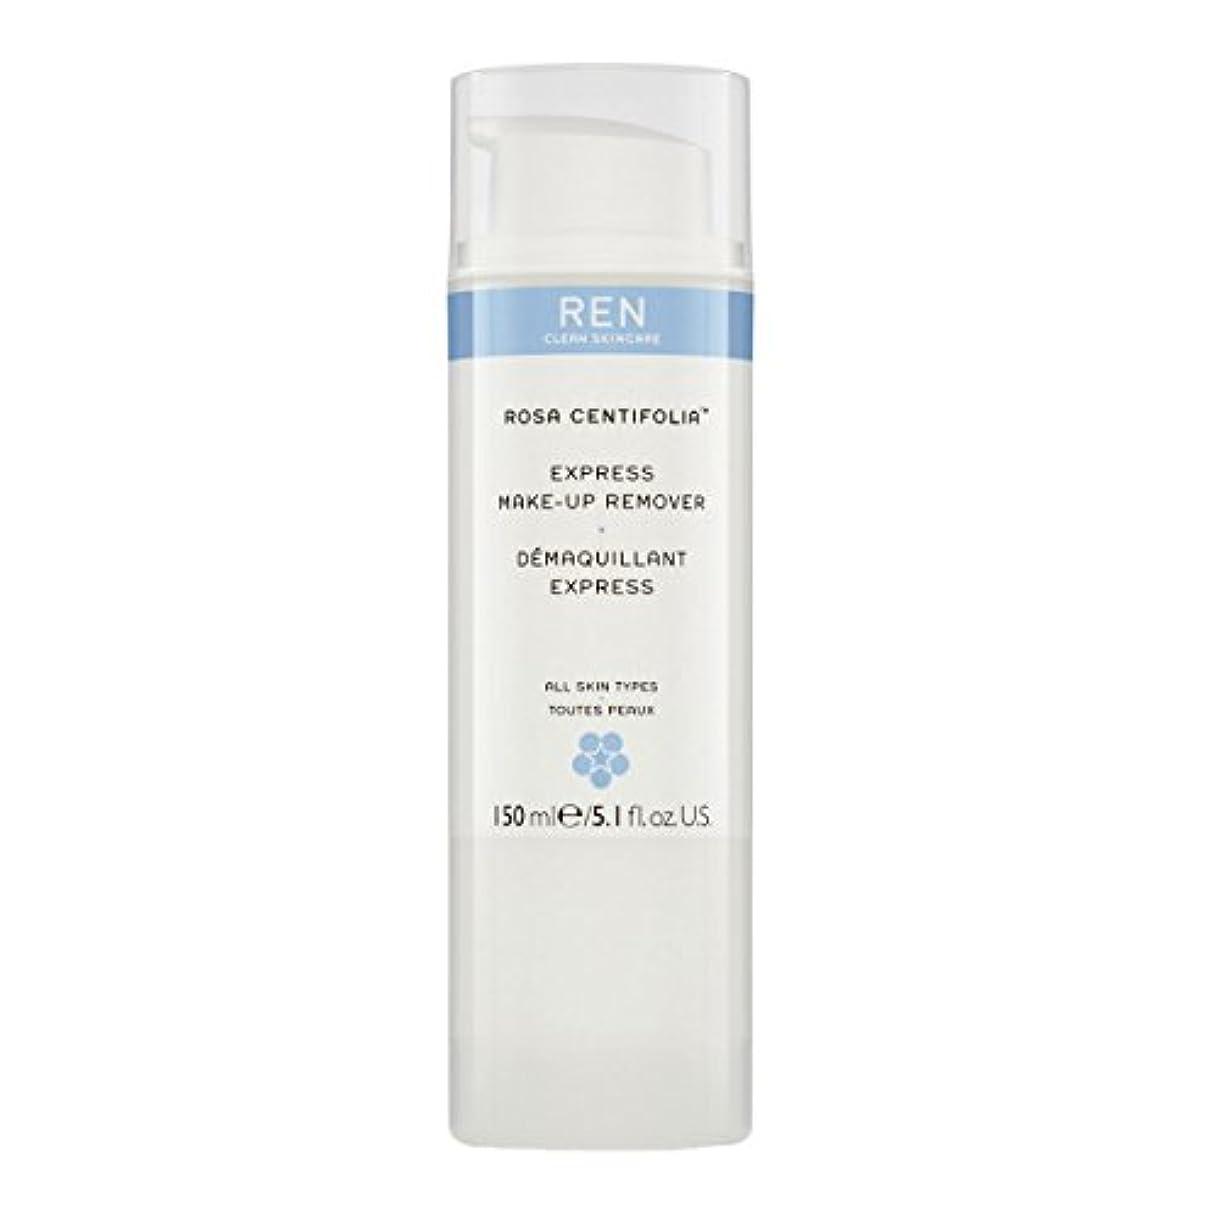 Ren Rosa Centifolia Express Make-Up Remover (並行輸入品) [並行輸入品]